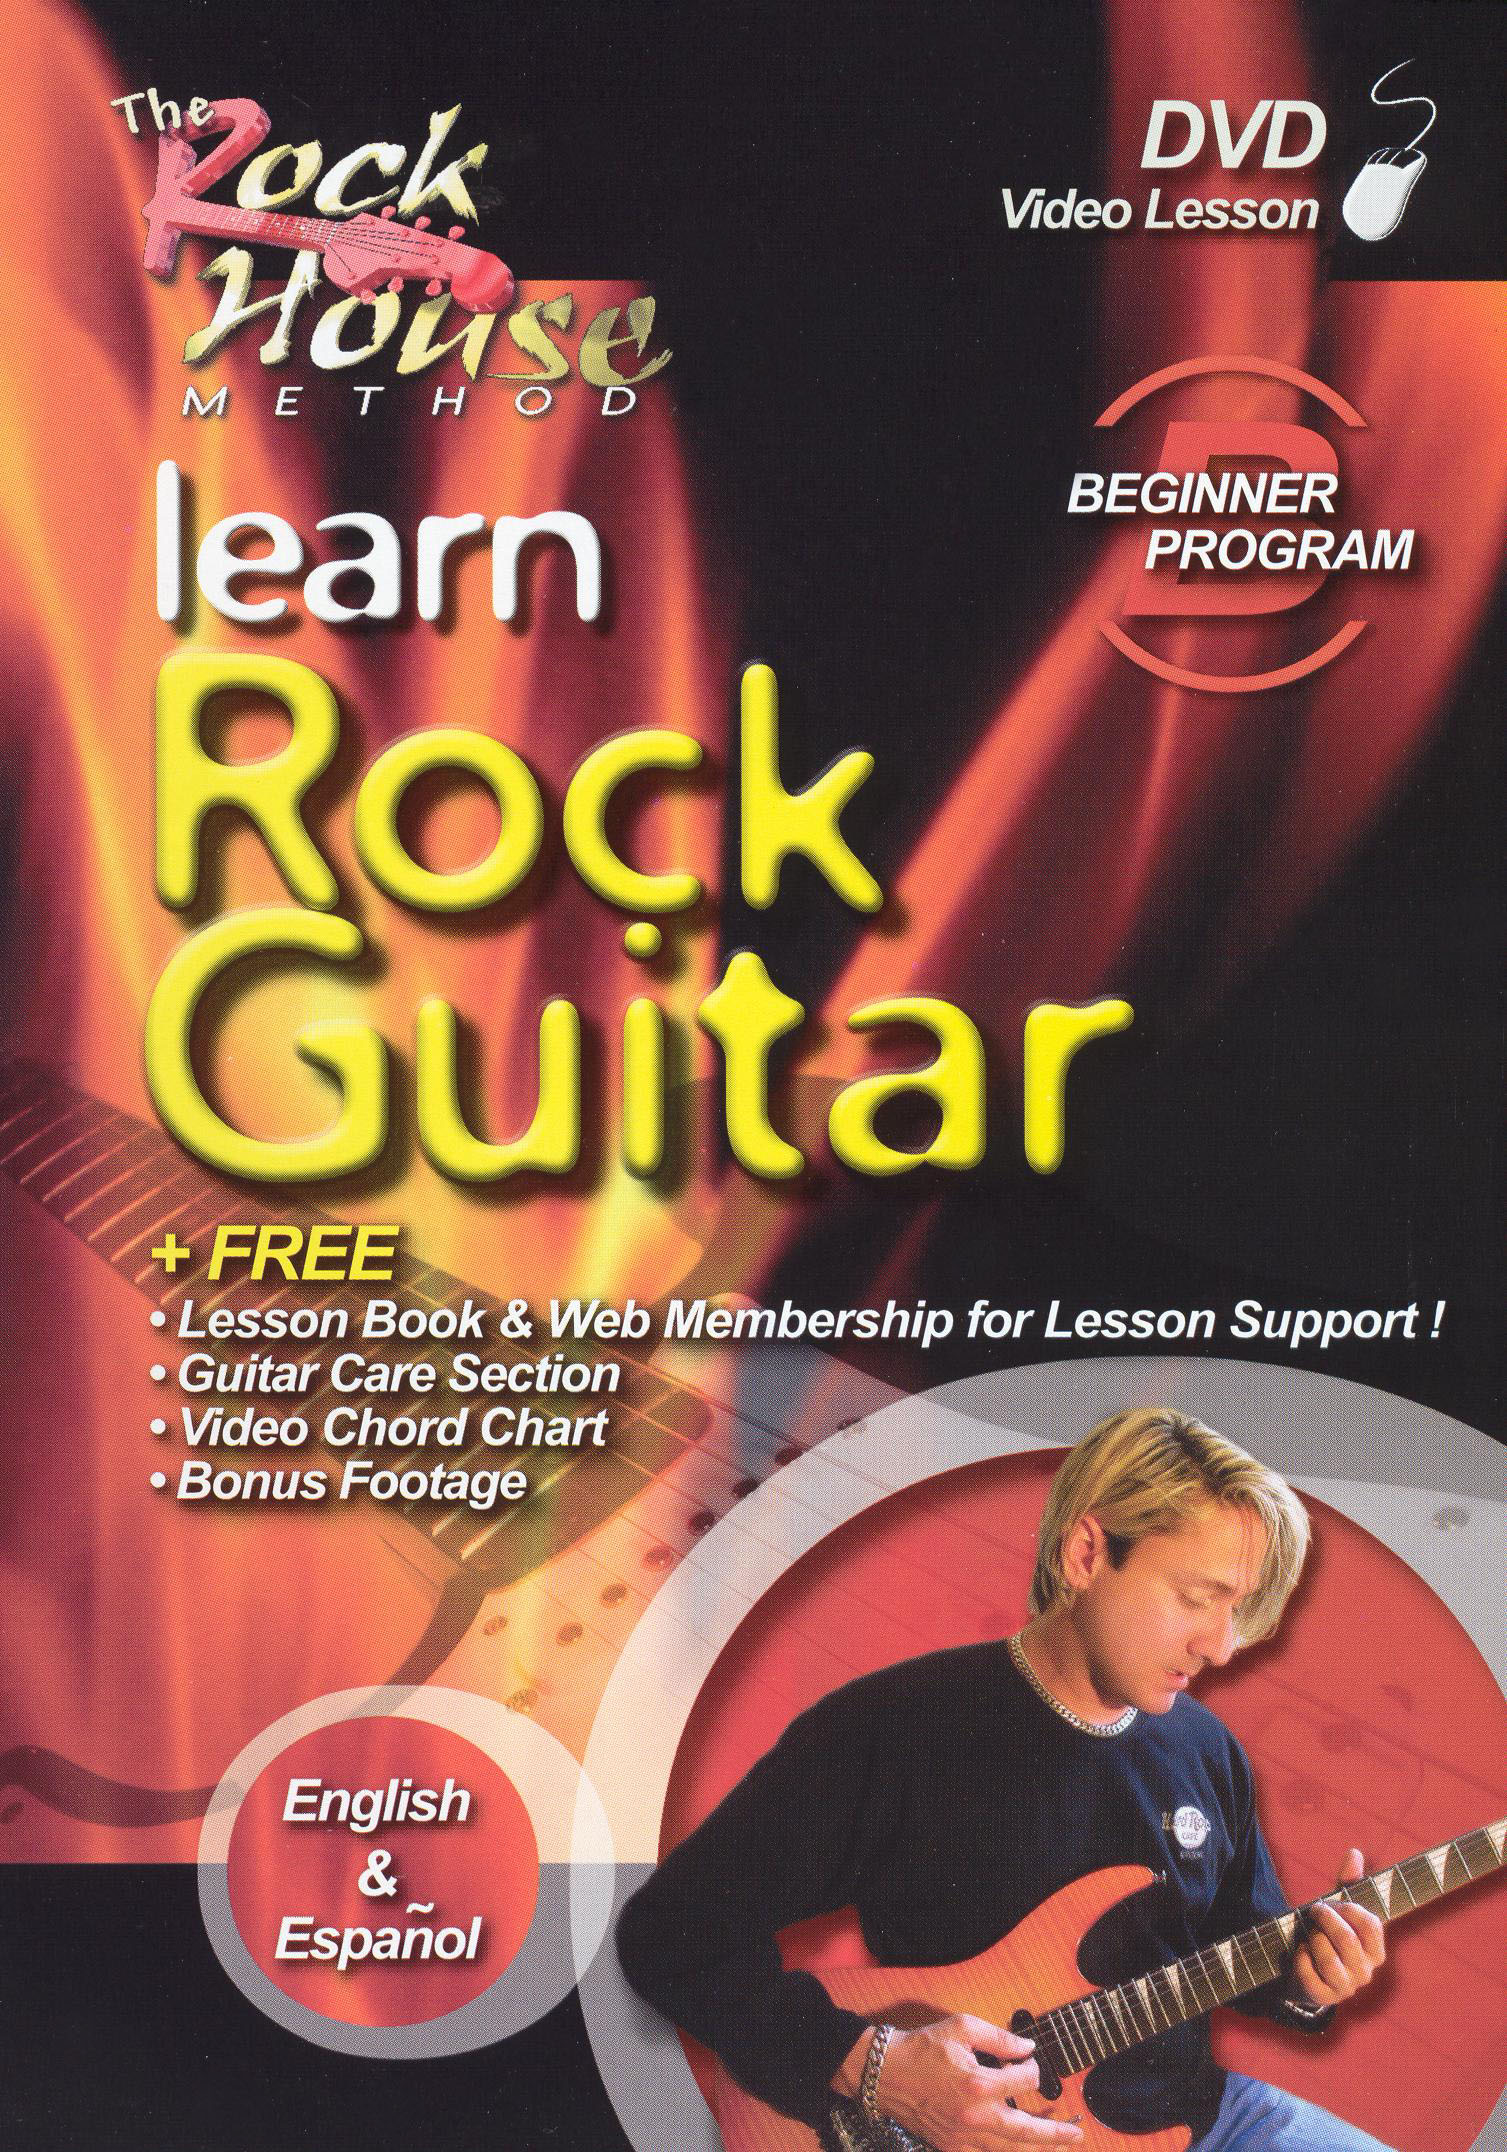 The Rock House Method: Learn Rock Guitar Beginner